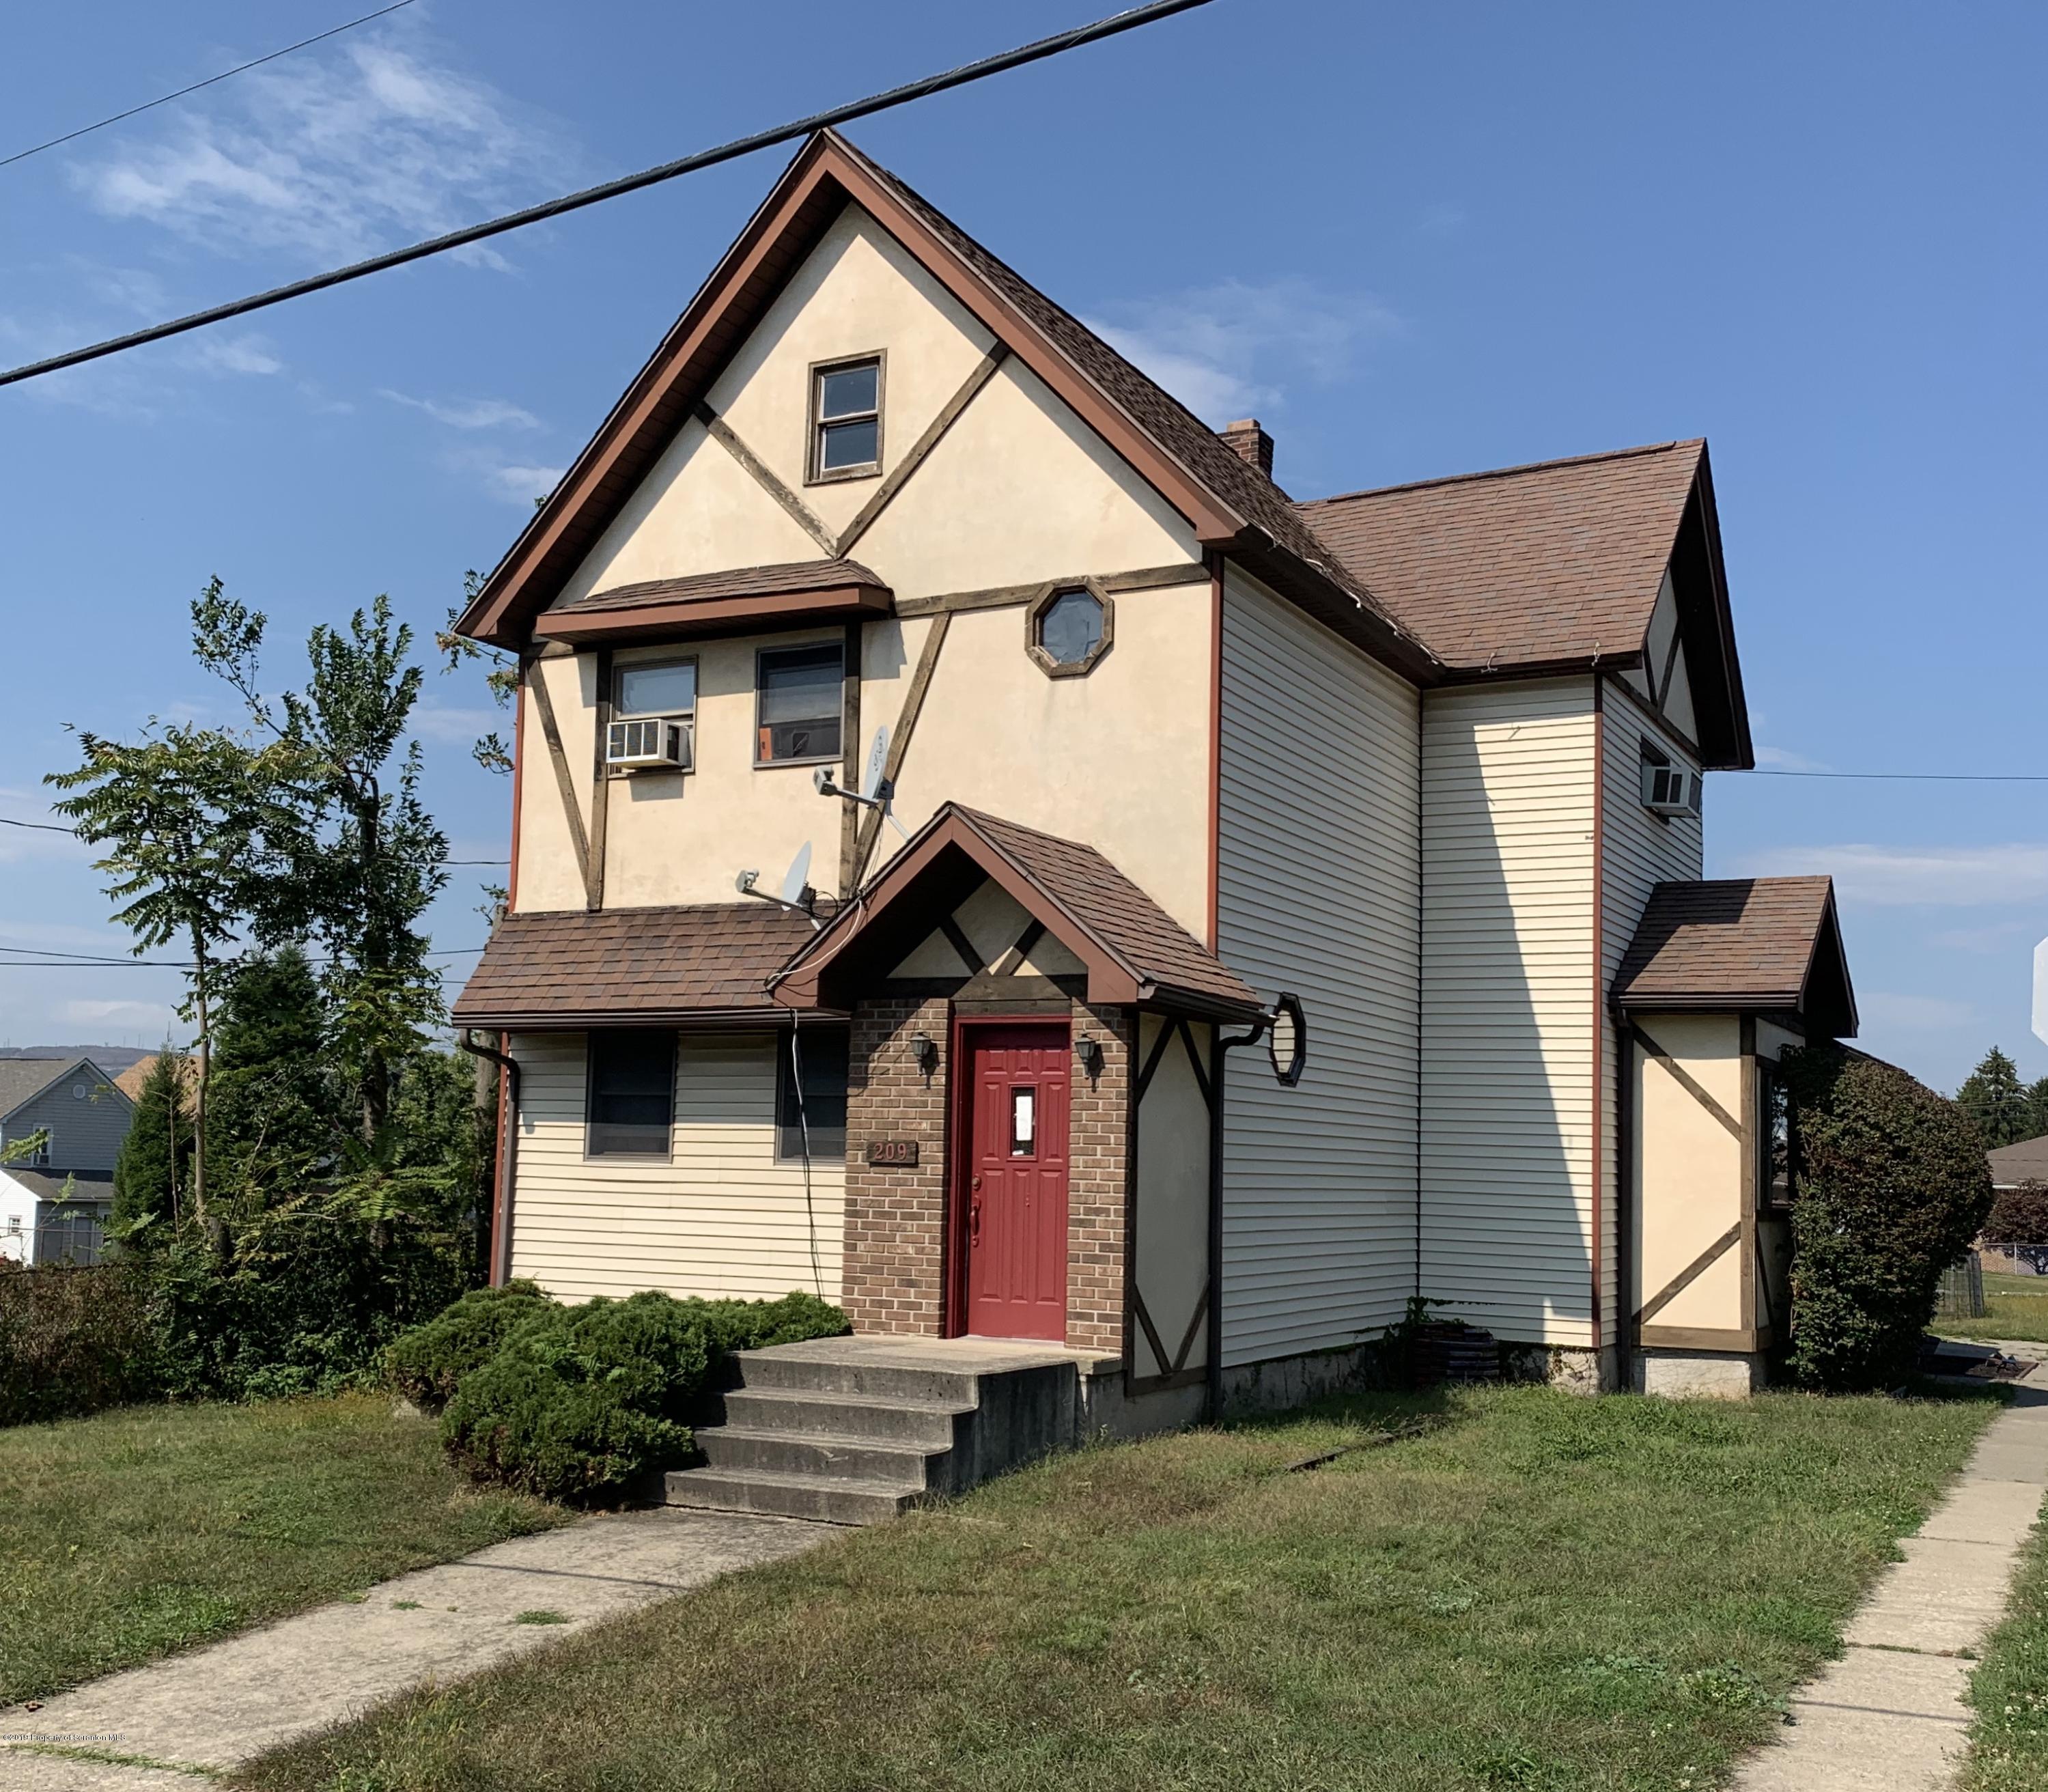 209 Ambrose St, Dunmore, Pennsylvania 18512, 4 Bedrooms Bedrooms, 10 Rooms Rooms,2 BathroomsBathrooms,Single Family,For Sale,Ambrose,19-4679